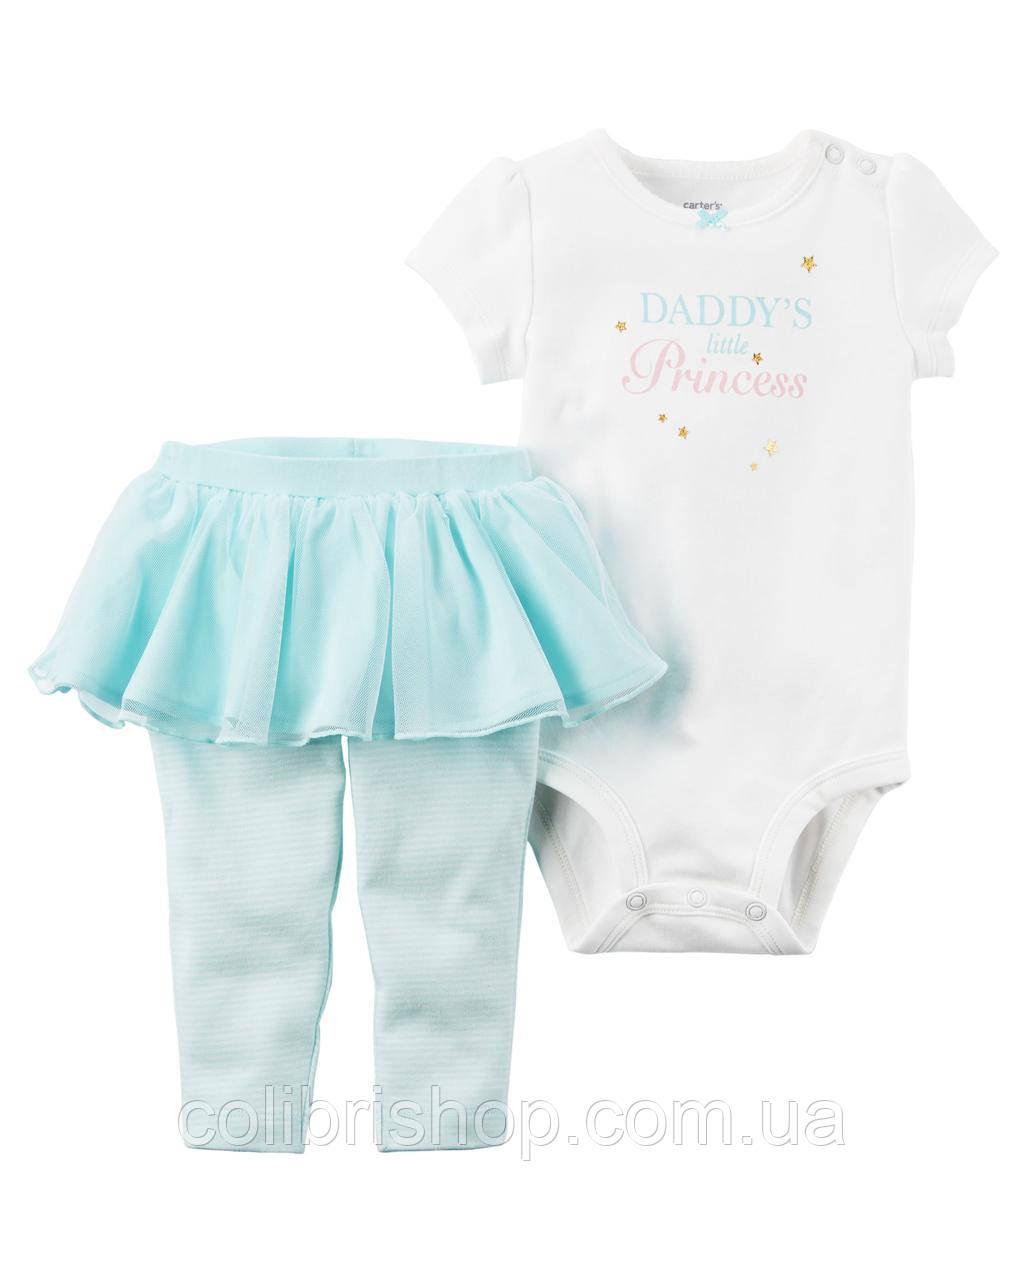 "Комплект ""DADDY'S PRINCESS"" (папина дочка) для девочки: боди с коротким рукавом и штанишки (24 мес)"